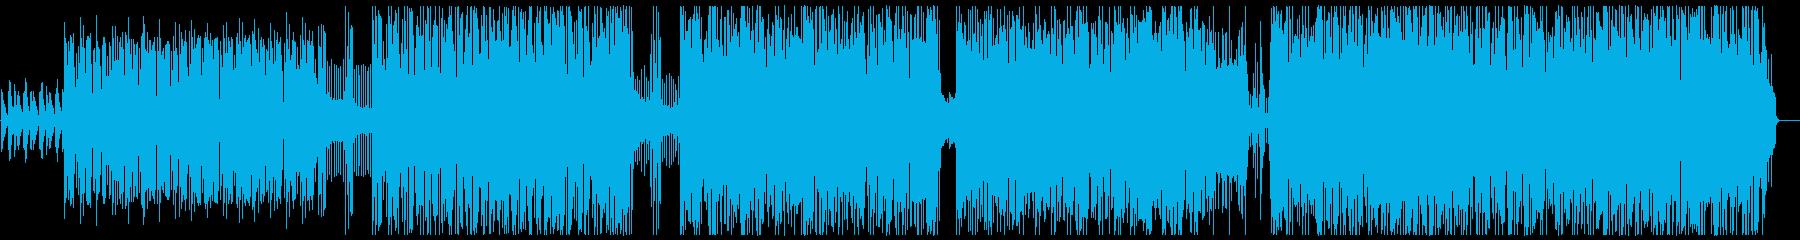 Senigalliaの再生済みの波形